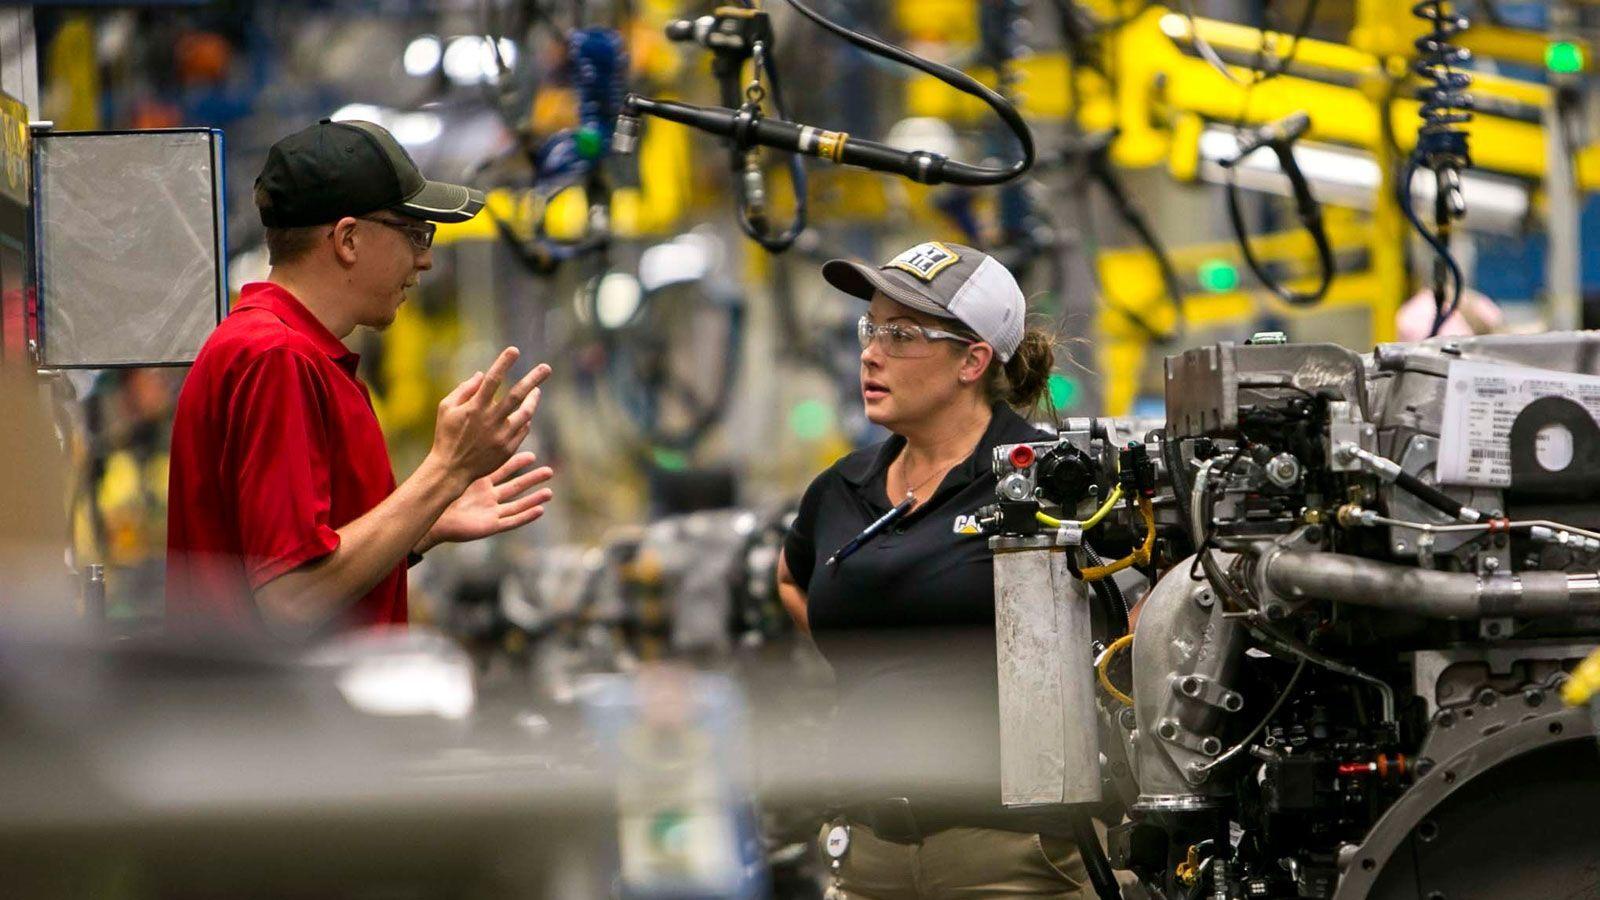 S&P 500, Nasdaq hit record highs as Google, McDonald's, 2Q GDP lift stocks | Fox Business